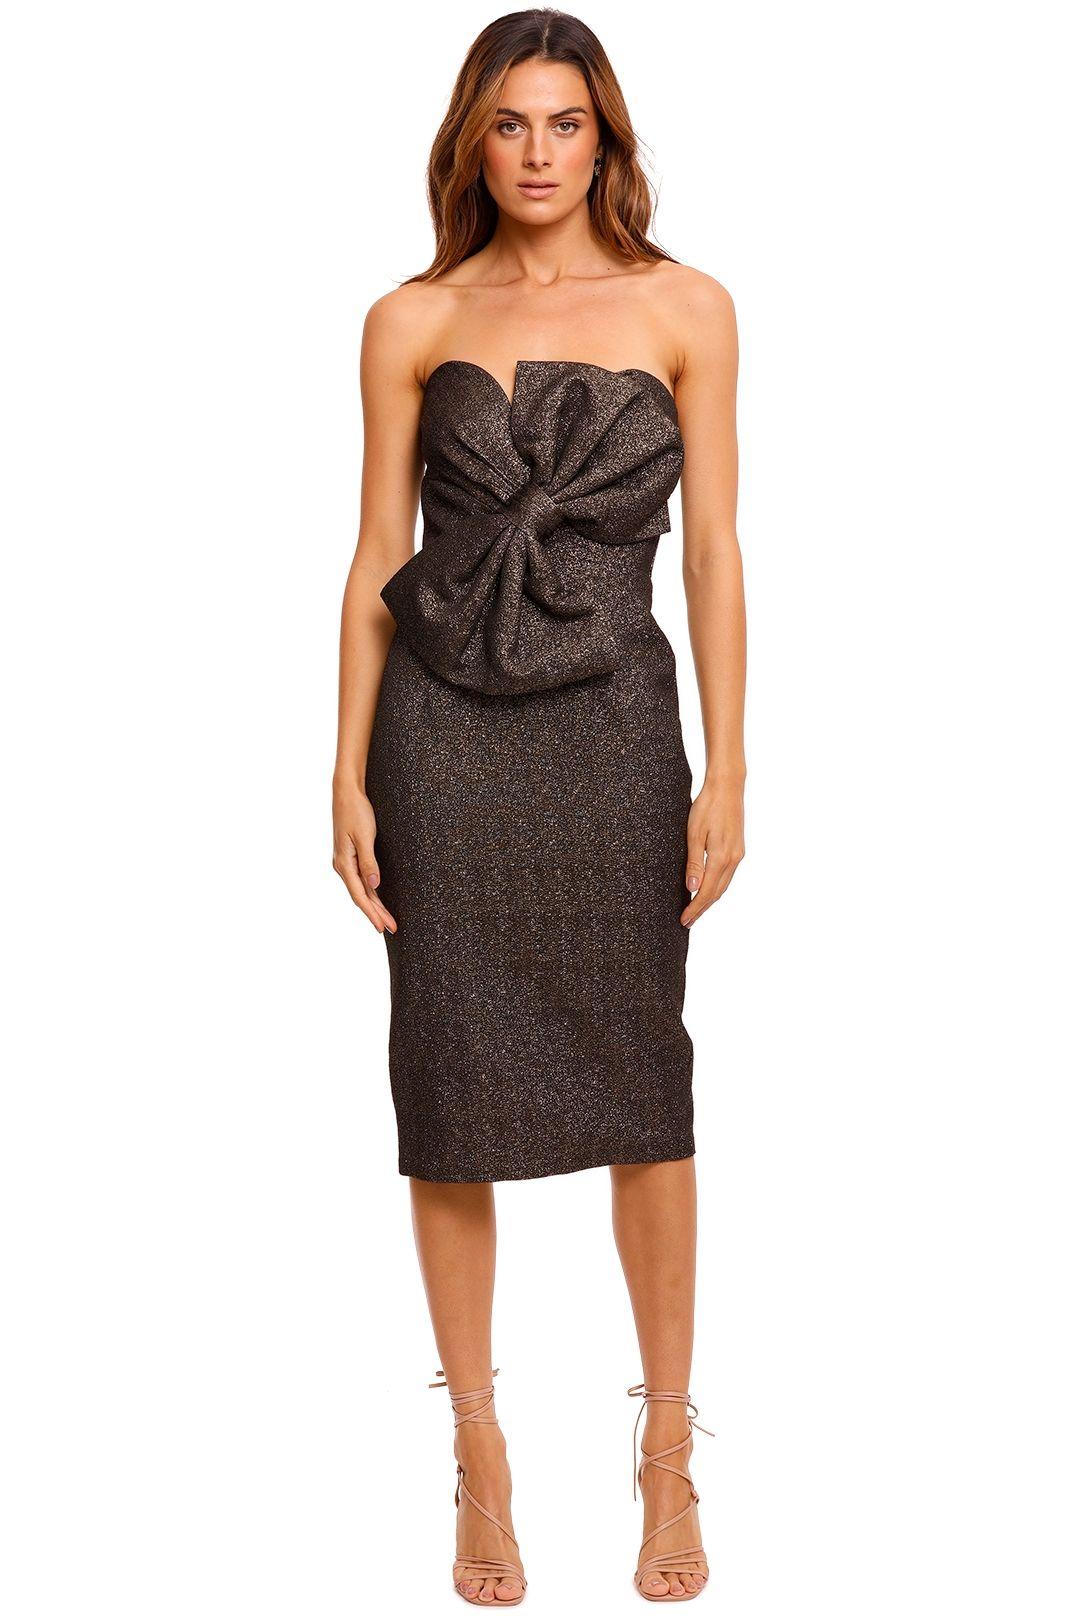 Elle Zeitoune Stella Strapless Midi Dress